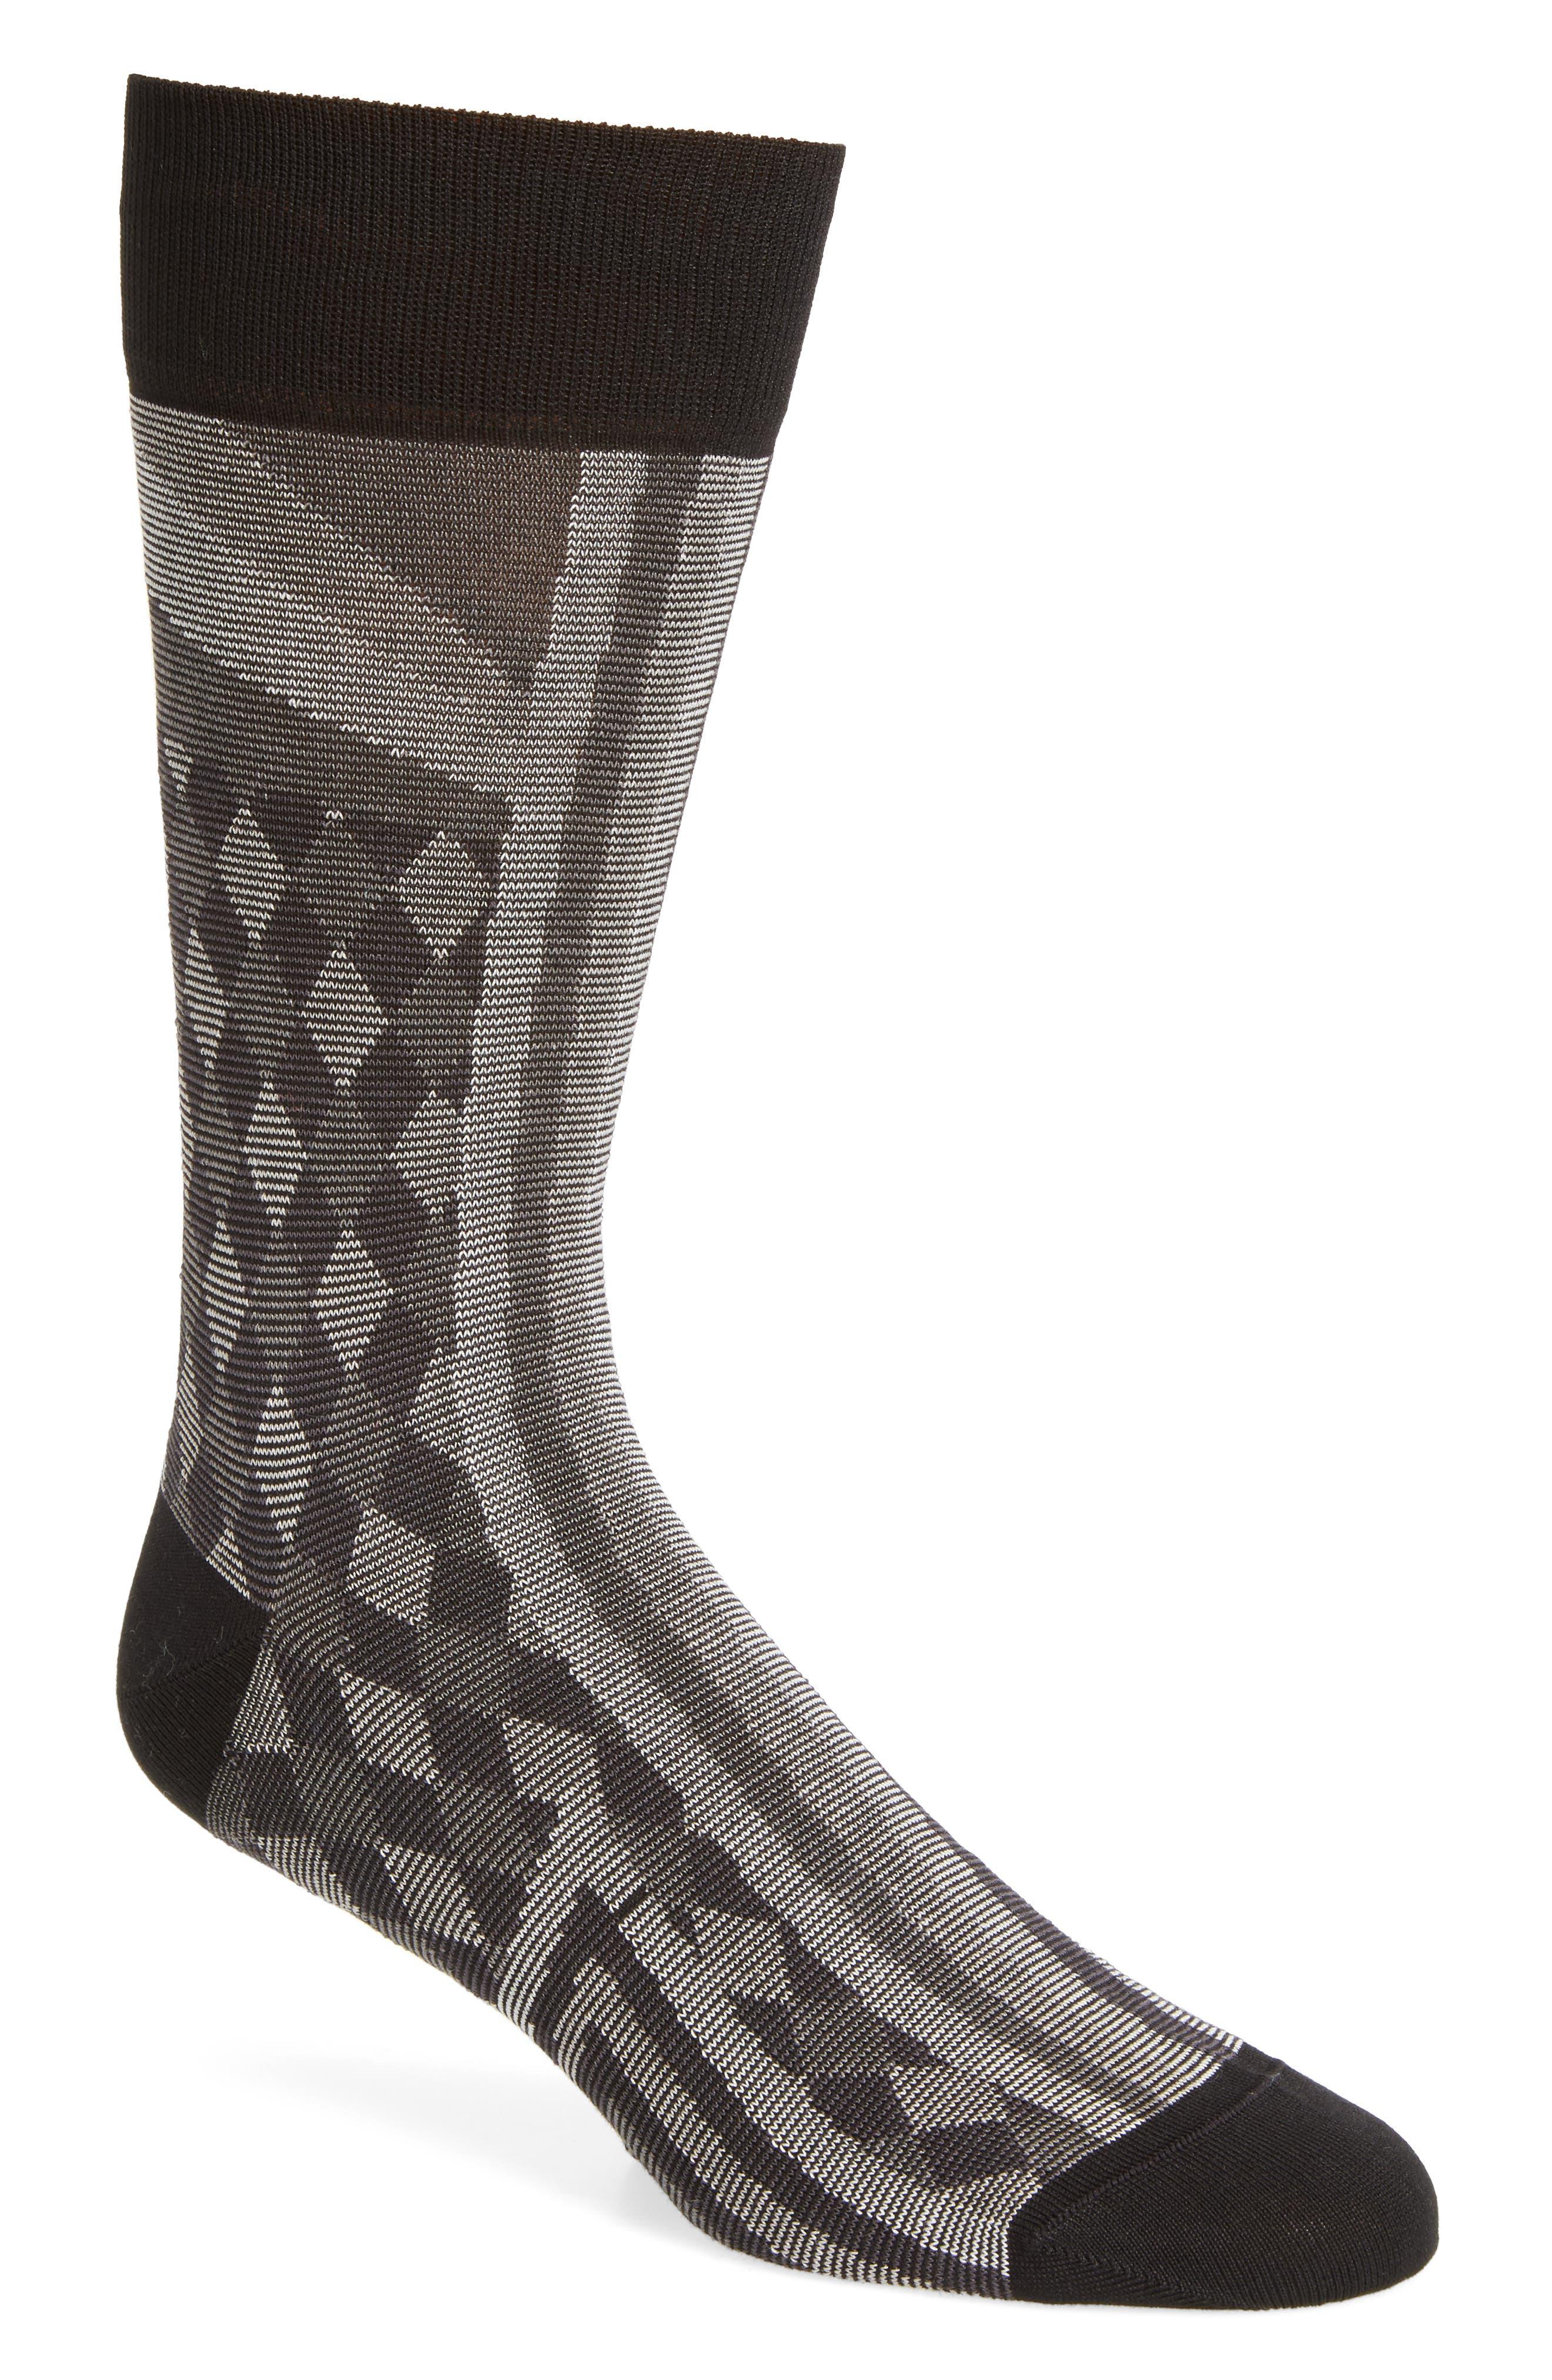 Checks & Stripes Crew Socks,                         Main,                         color, 001